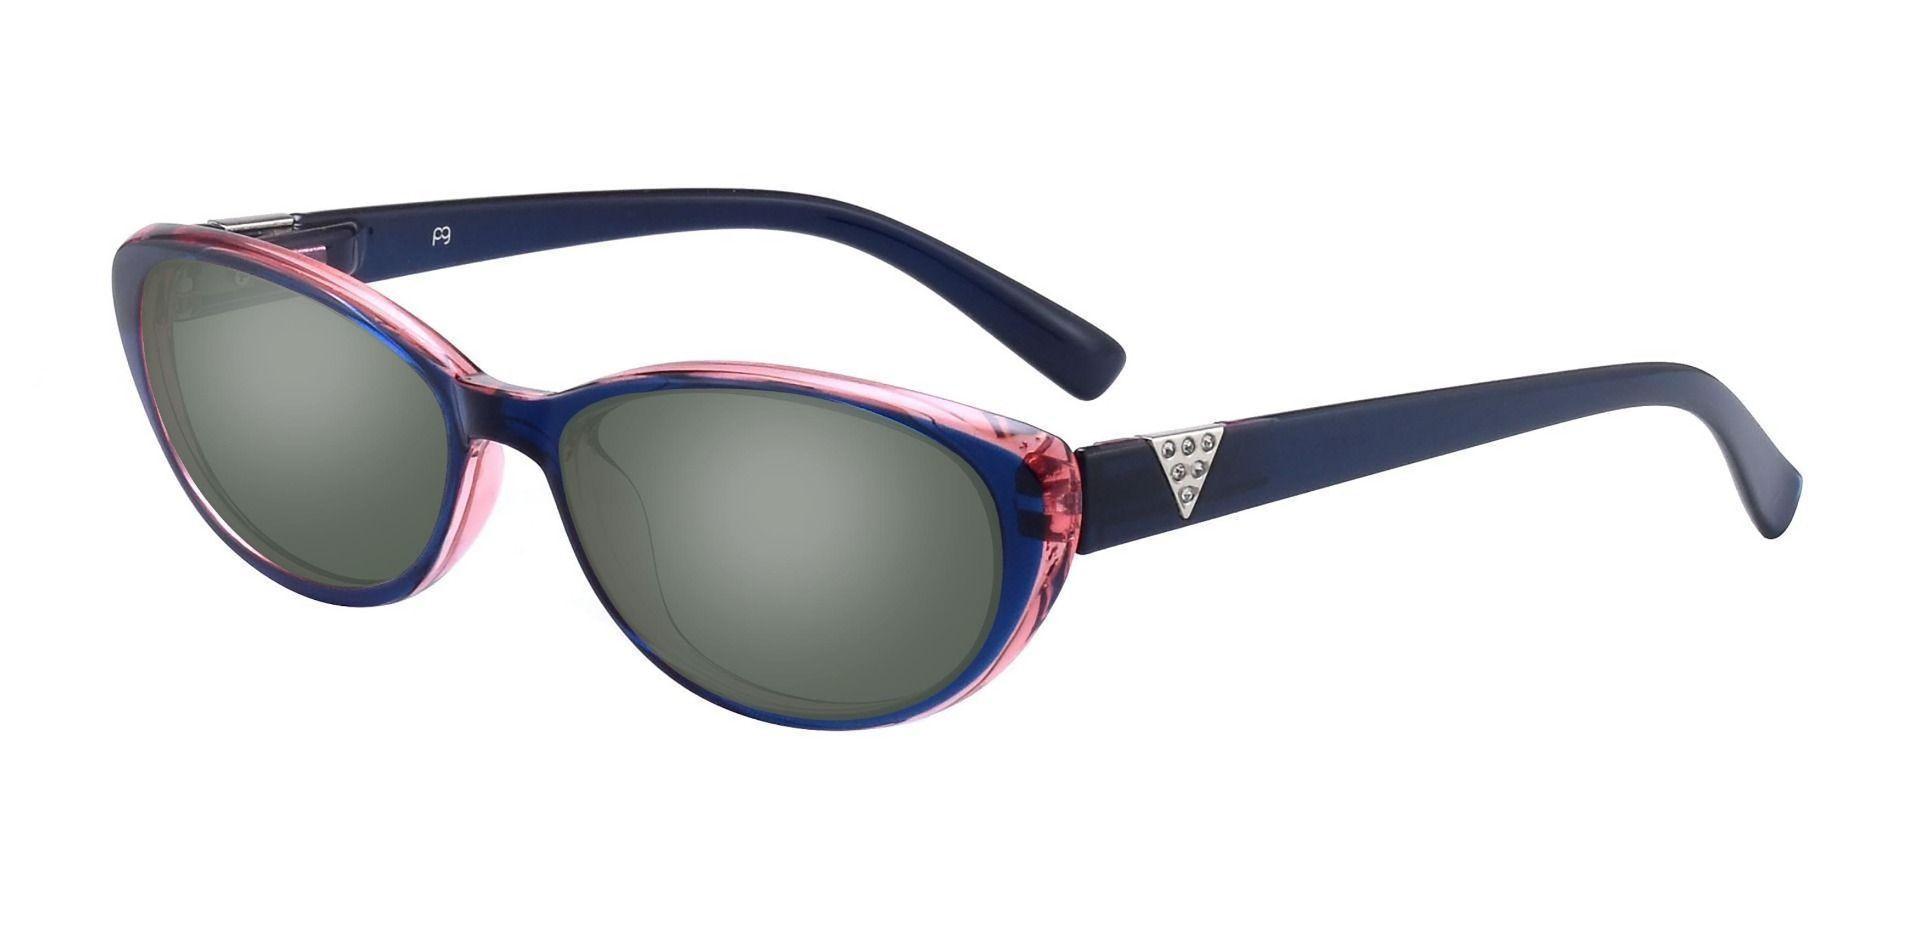 Iona Cat-Eye Prescription Sunglasses -  Blue Frame With Green Lenses